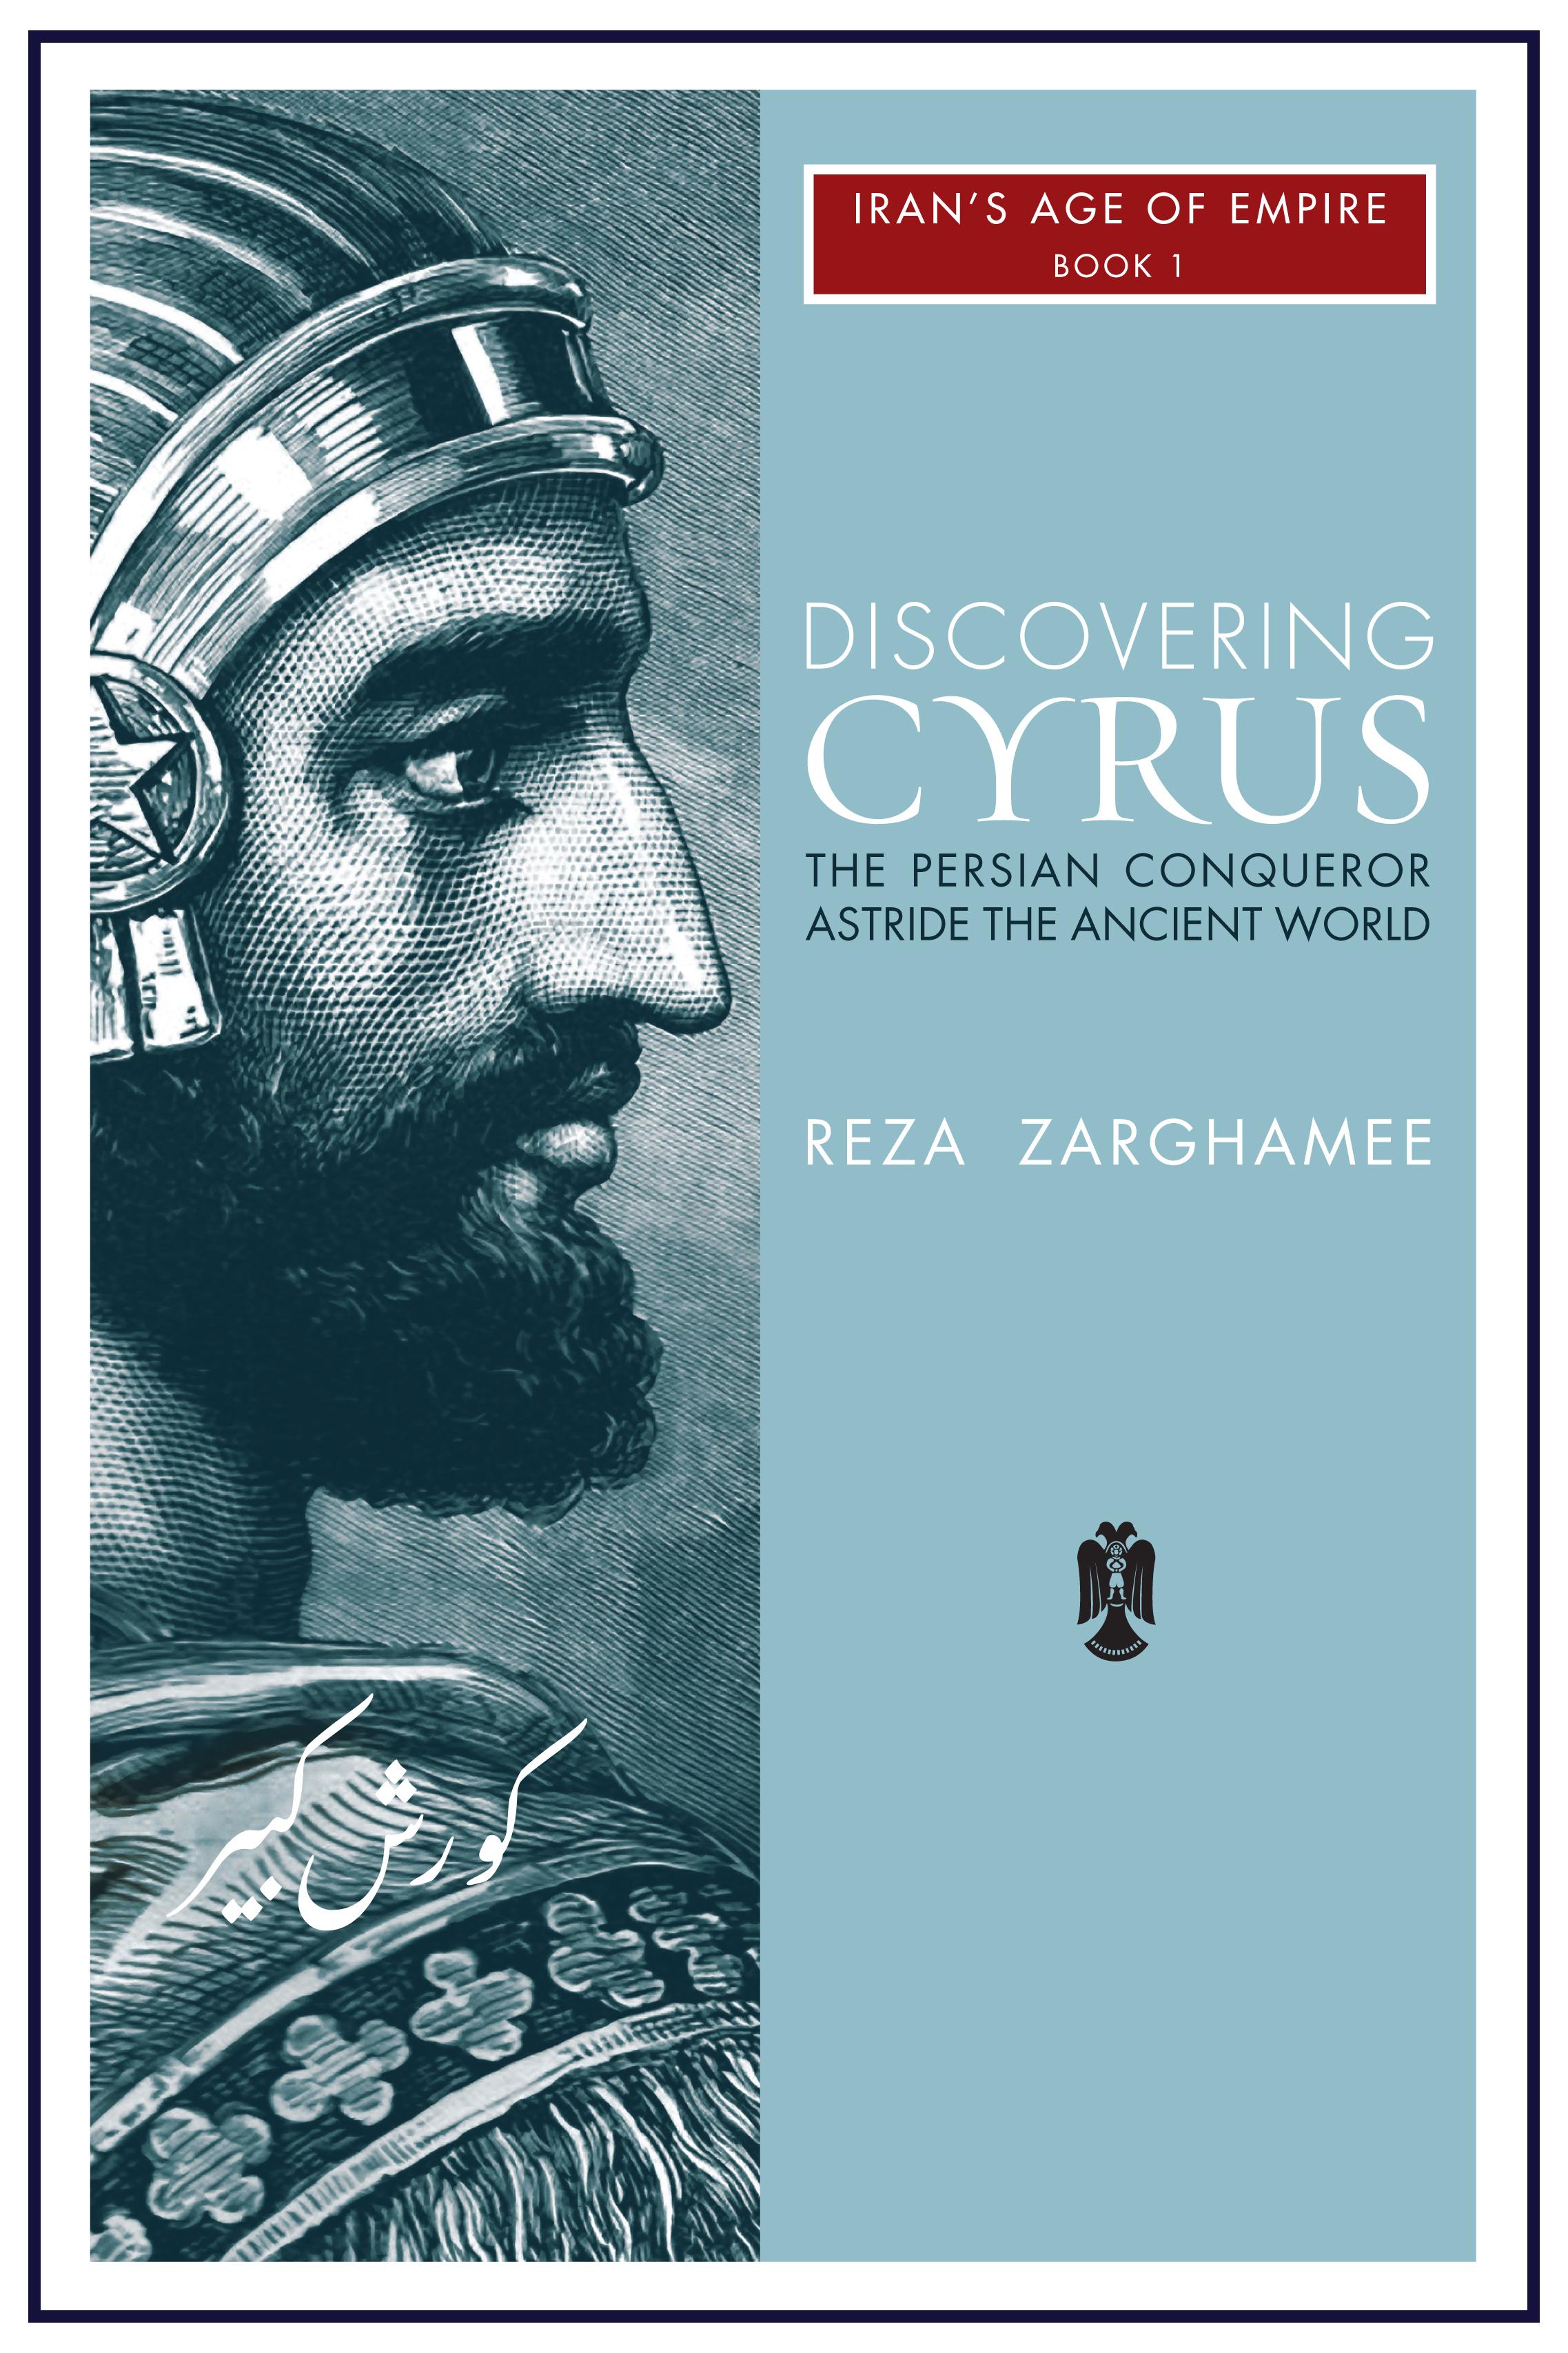 Discovering Cyrus.jpg